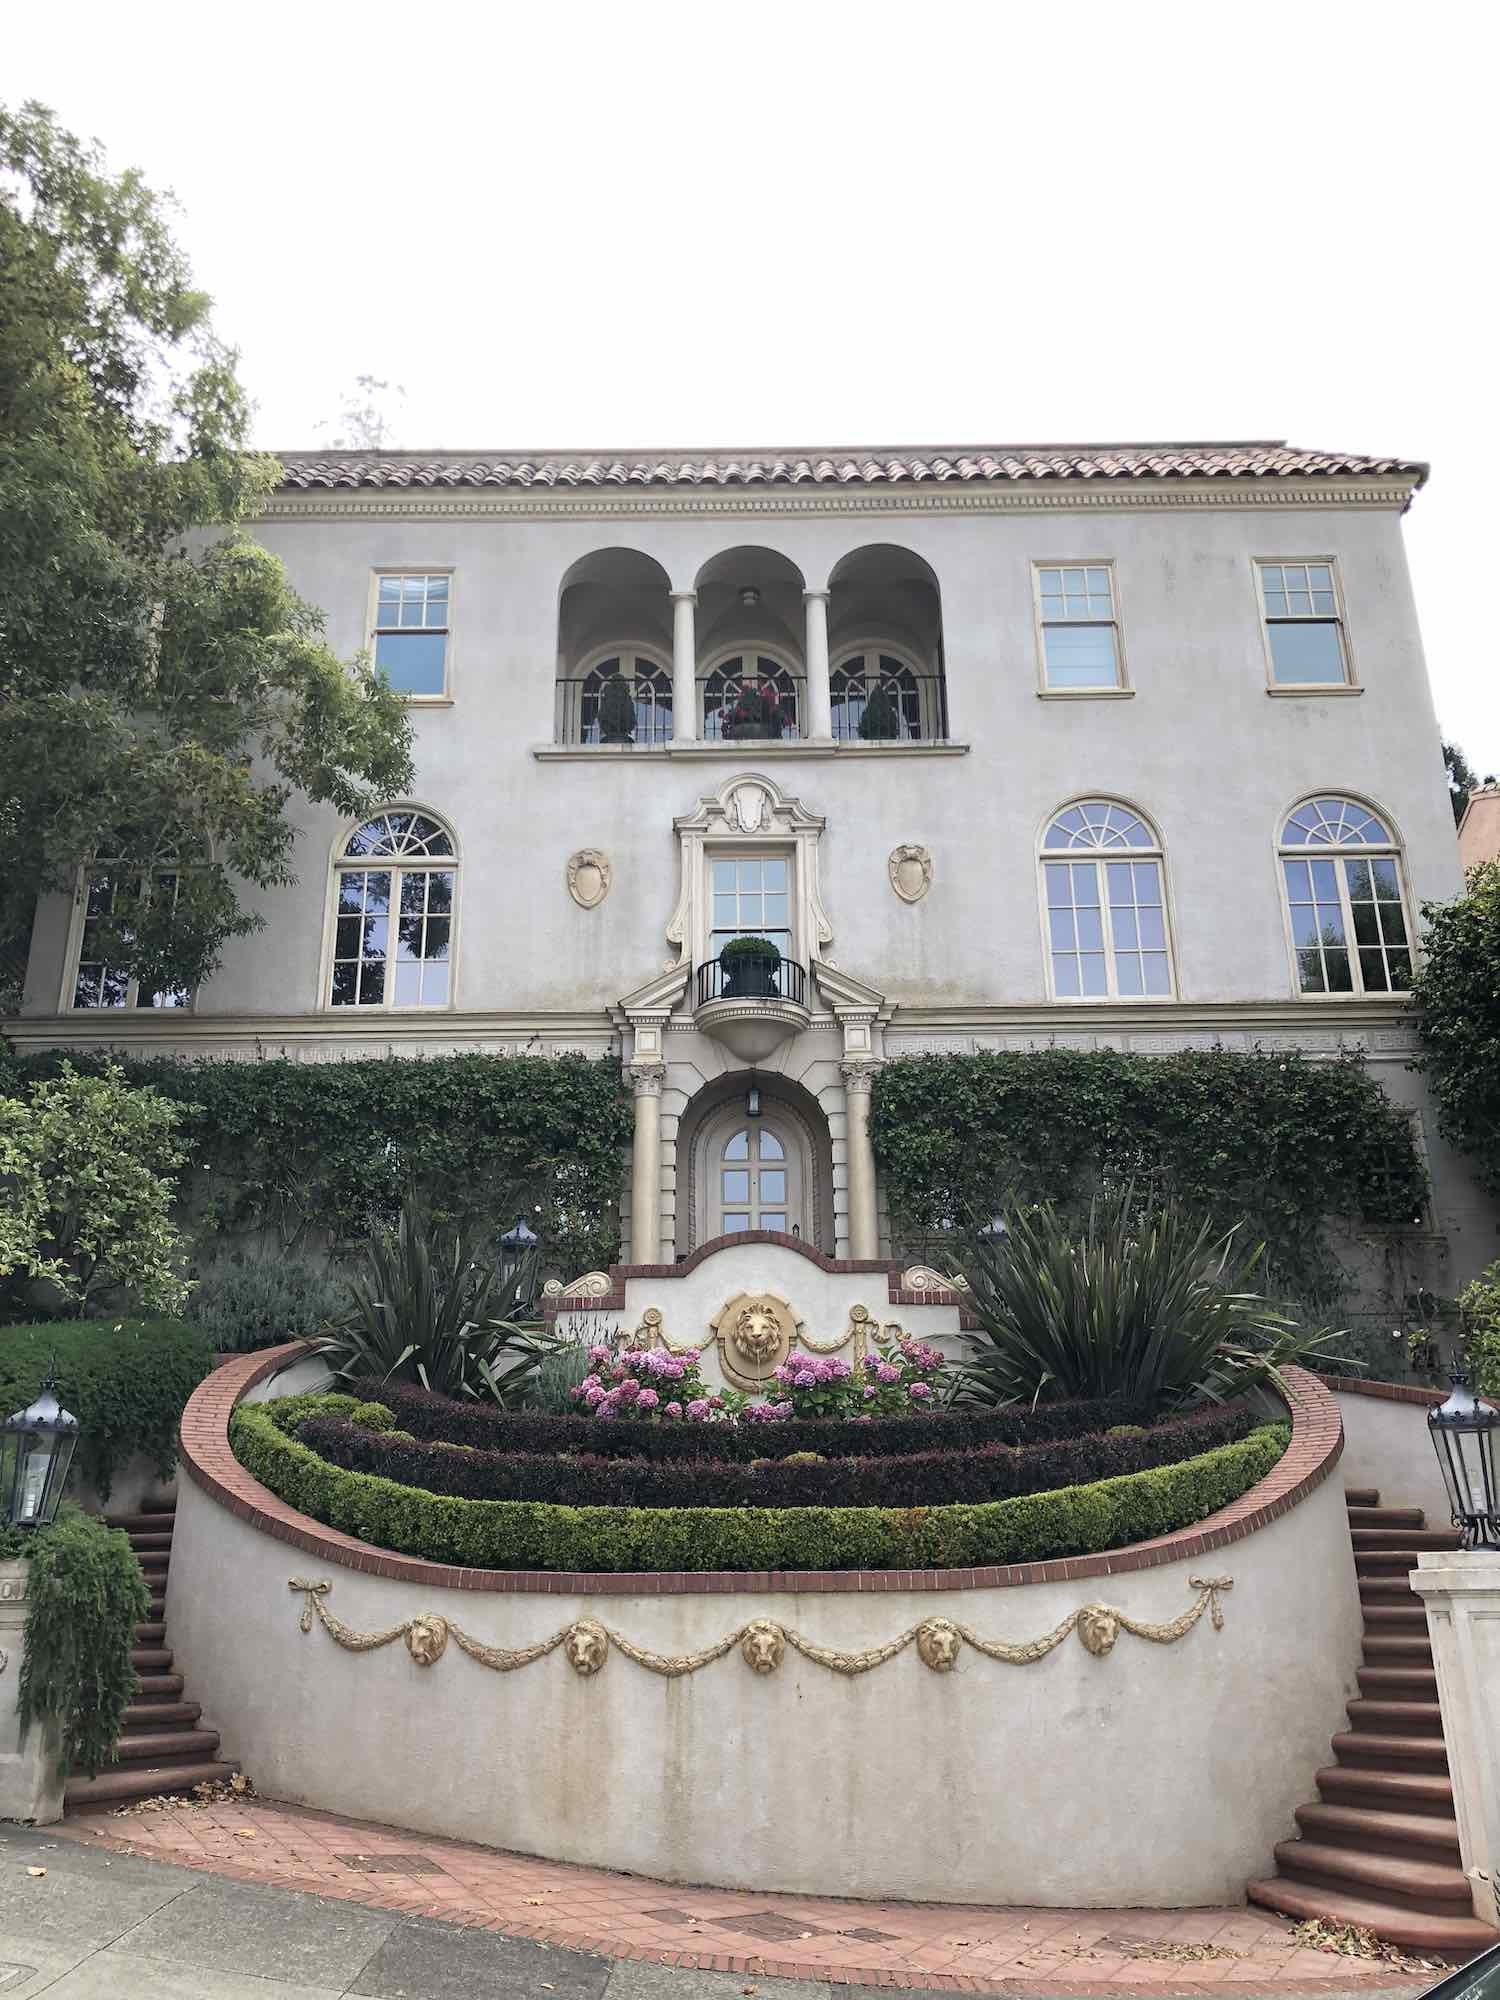 Instagram Worthy Spots in San Francisco - Princess Diaries School